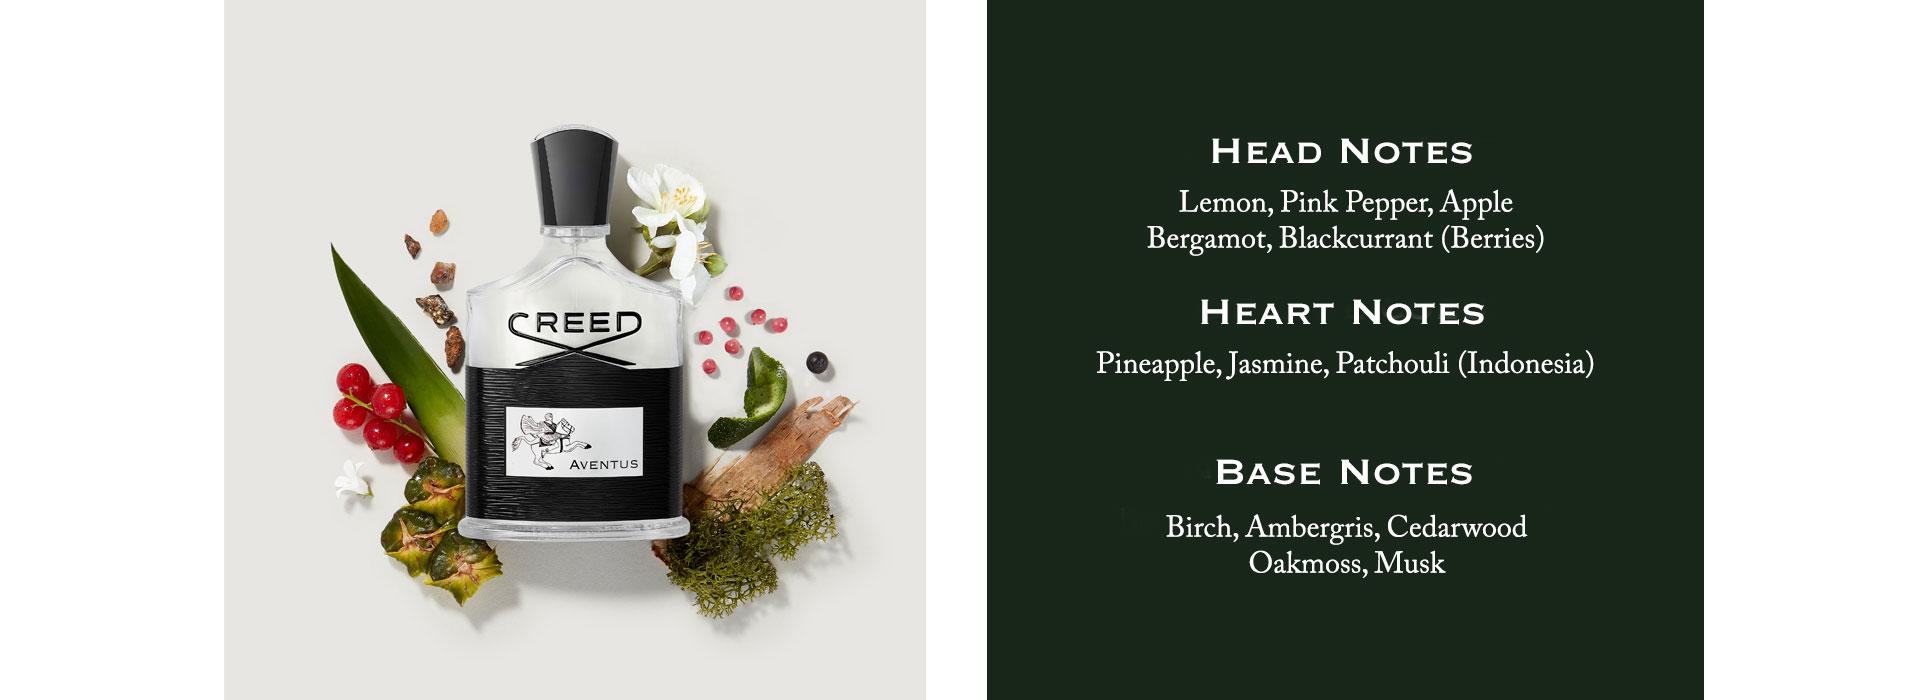 Head Notes: Lemon, Pink Pepper, Apple, Bergamot, Blackcurrant (Berries). Heart Notes: Pineapple, Jasmine, Patchouli (Indonesia). Base Notes: Birch, Ambergris, Cedarwood, Oakmoss, Musk.